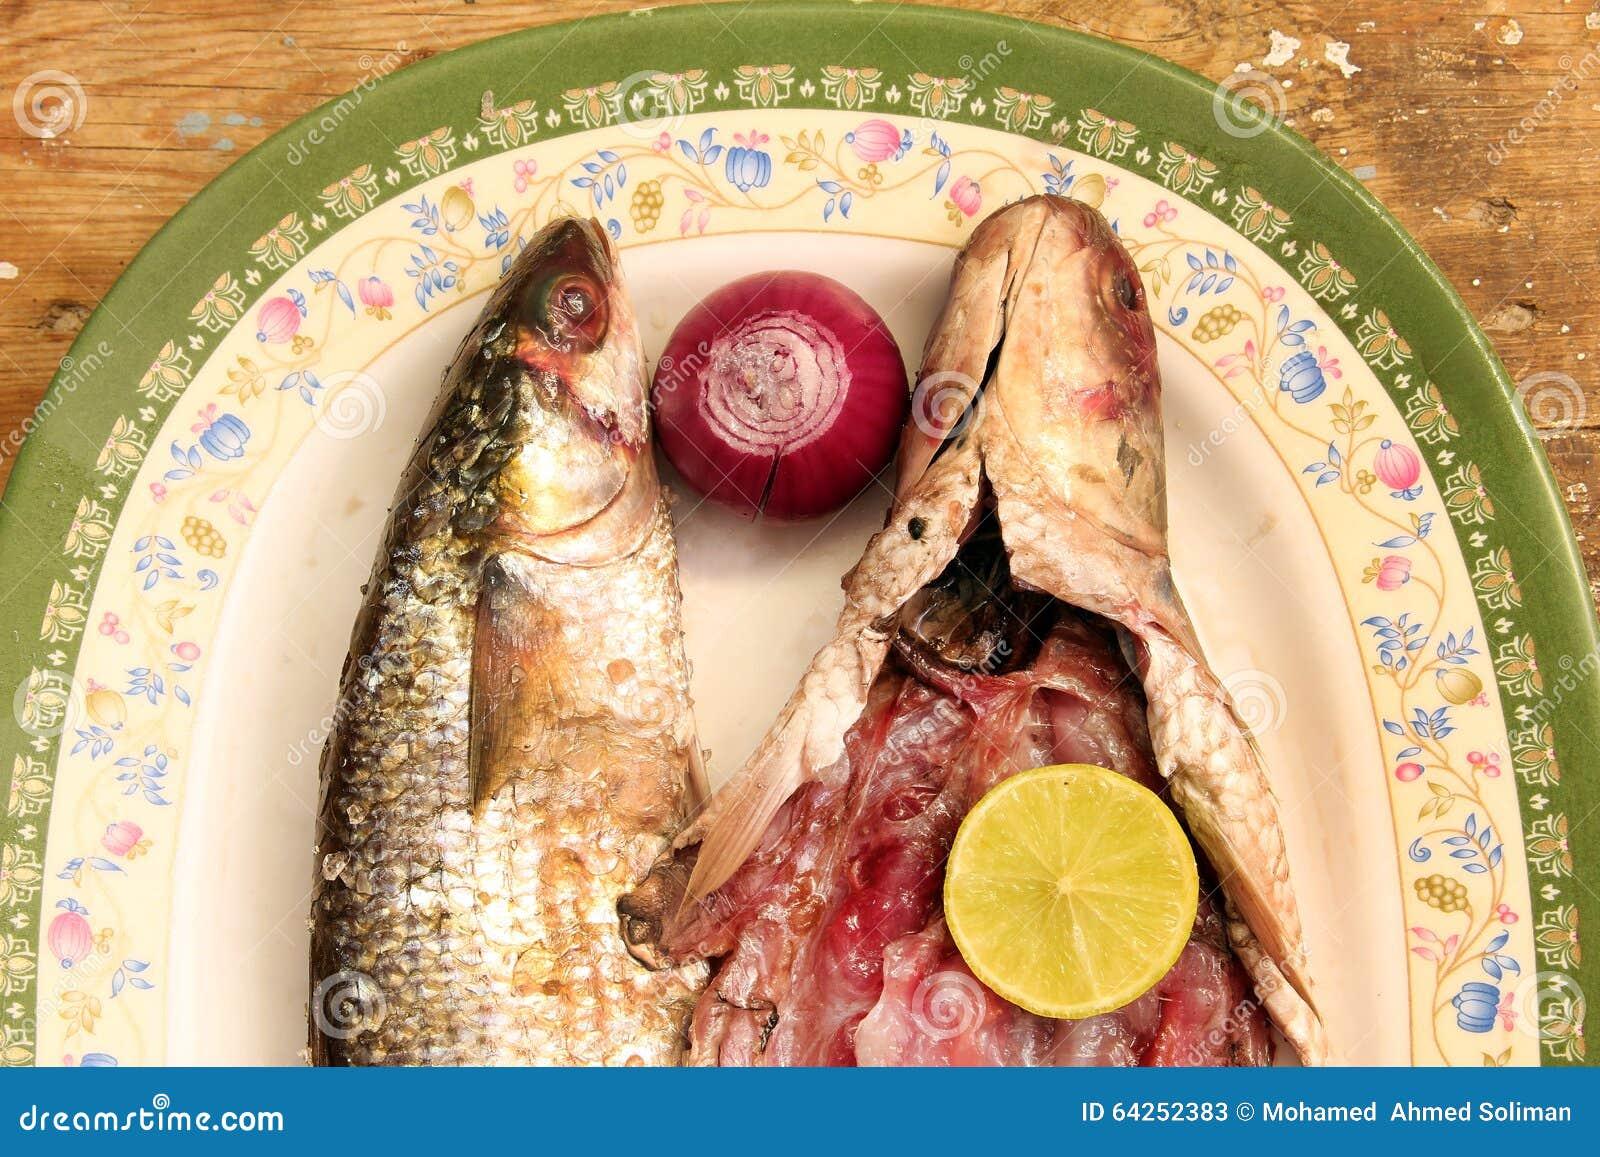 Arabian egyptian salt fish stock image image of salt for Eating mullet fish